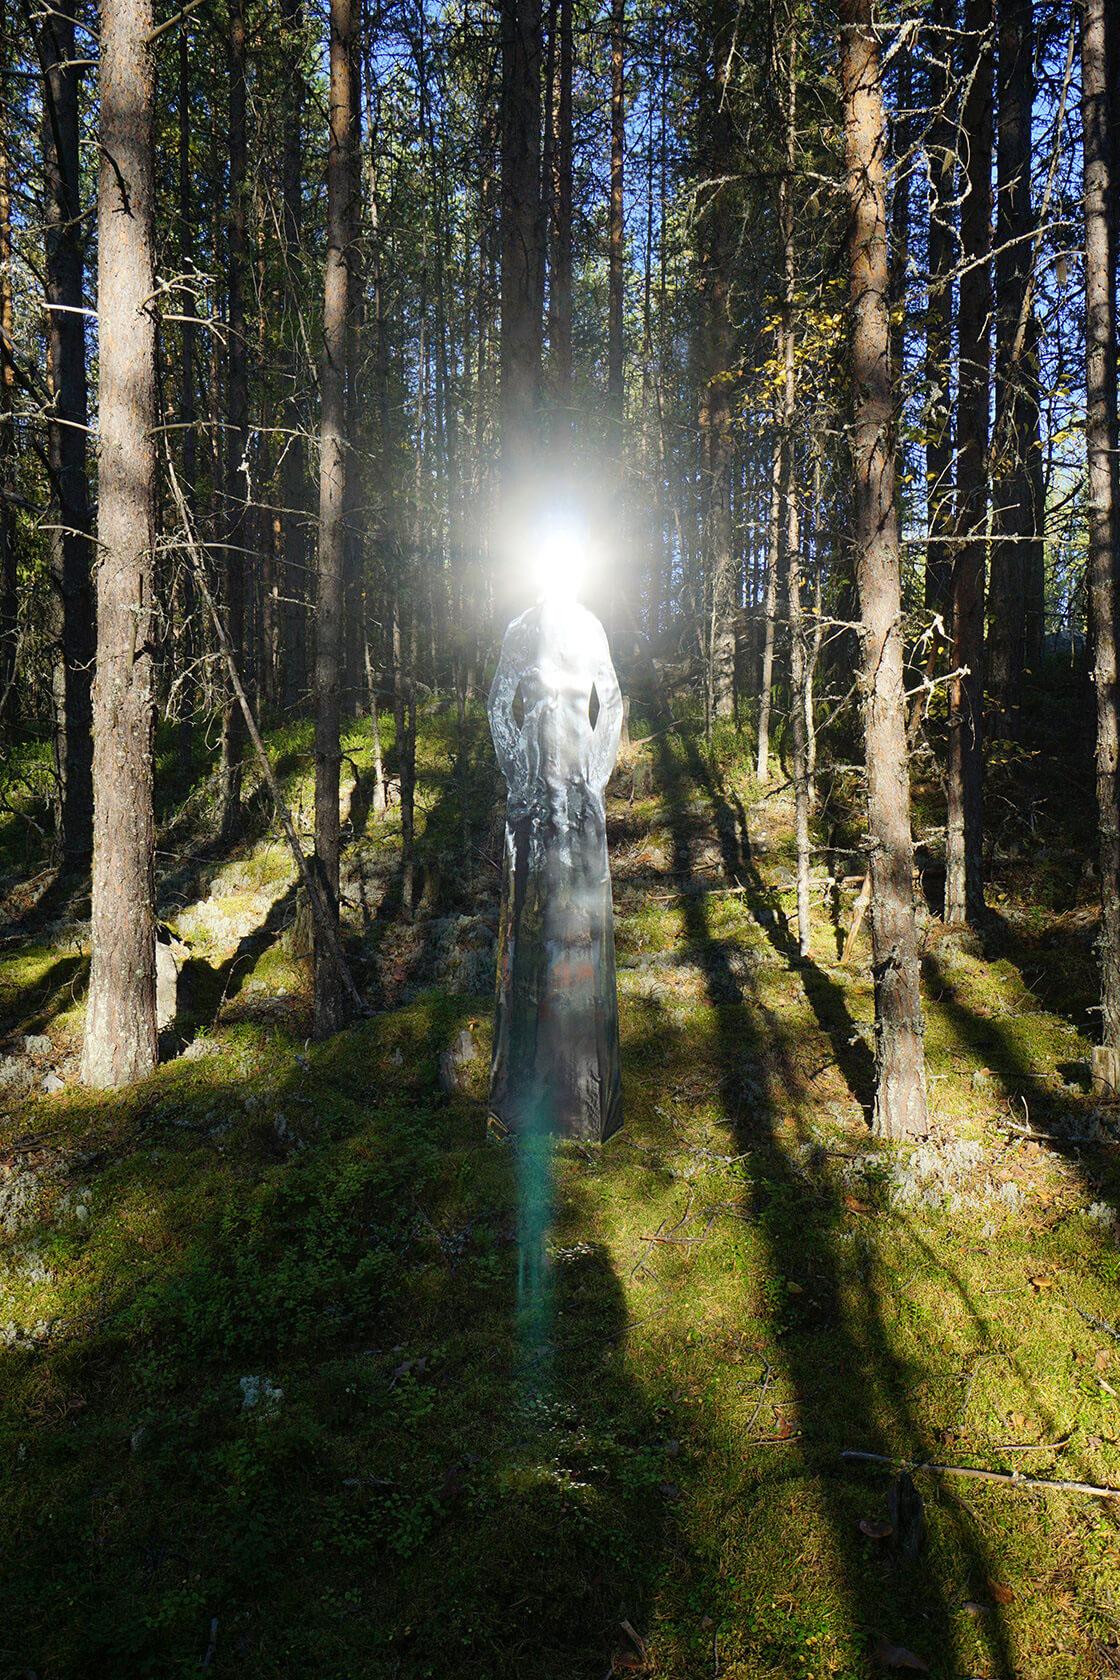 contemporaryart art photoart light mirror